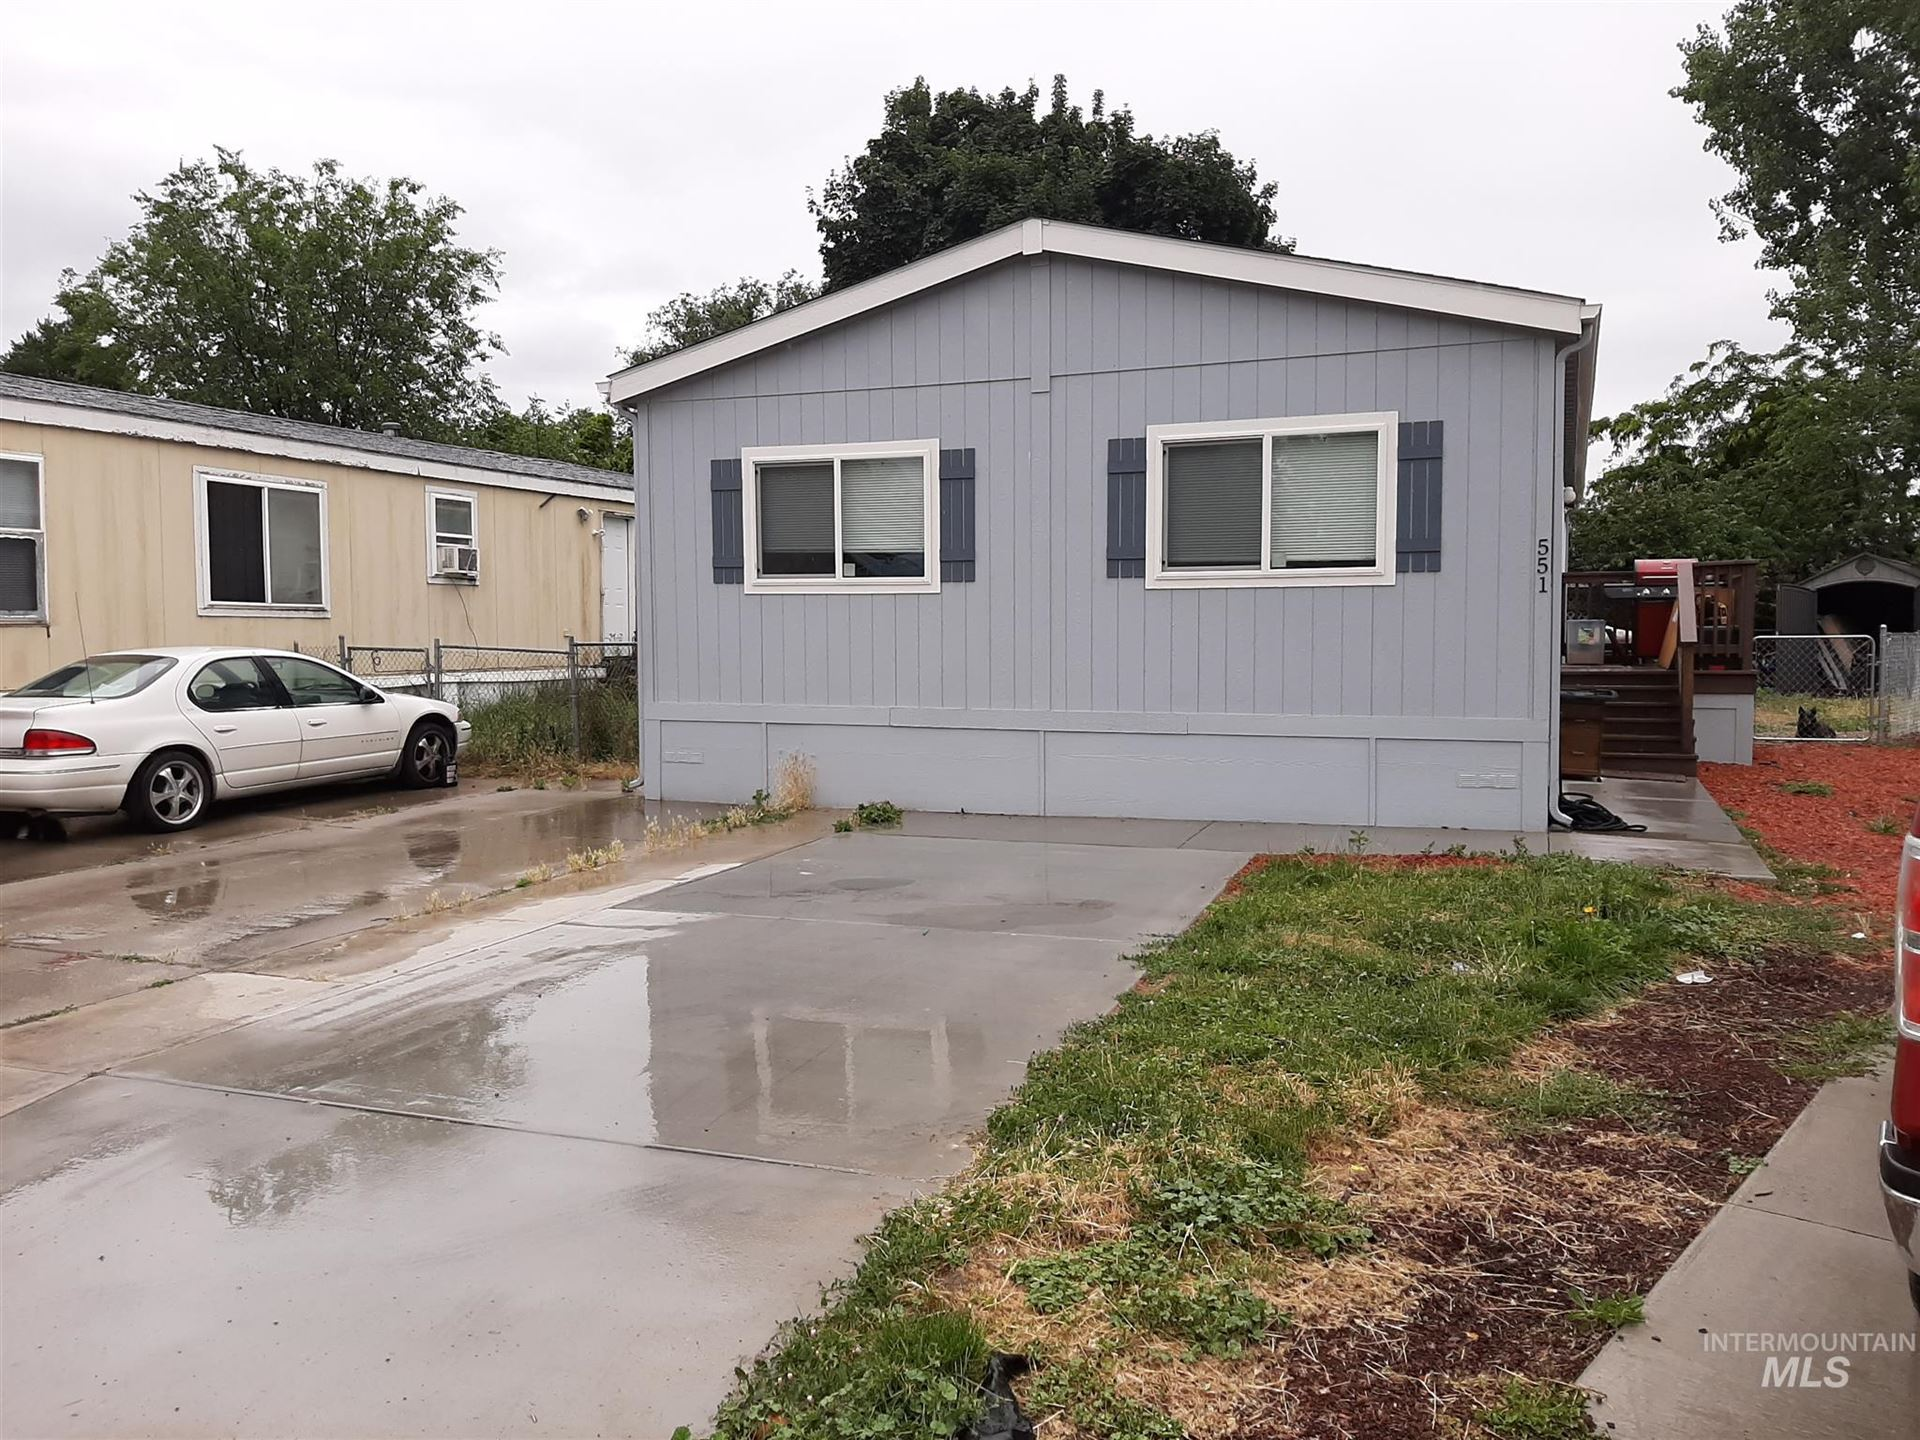 551 N Meadowland Circle, Boise, ID 83713 - MLS#: 98772110